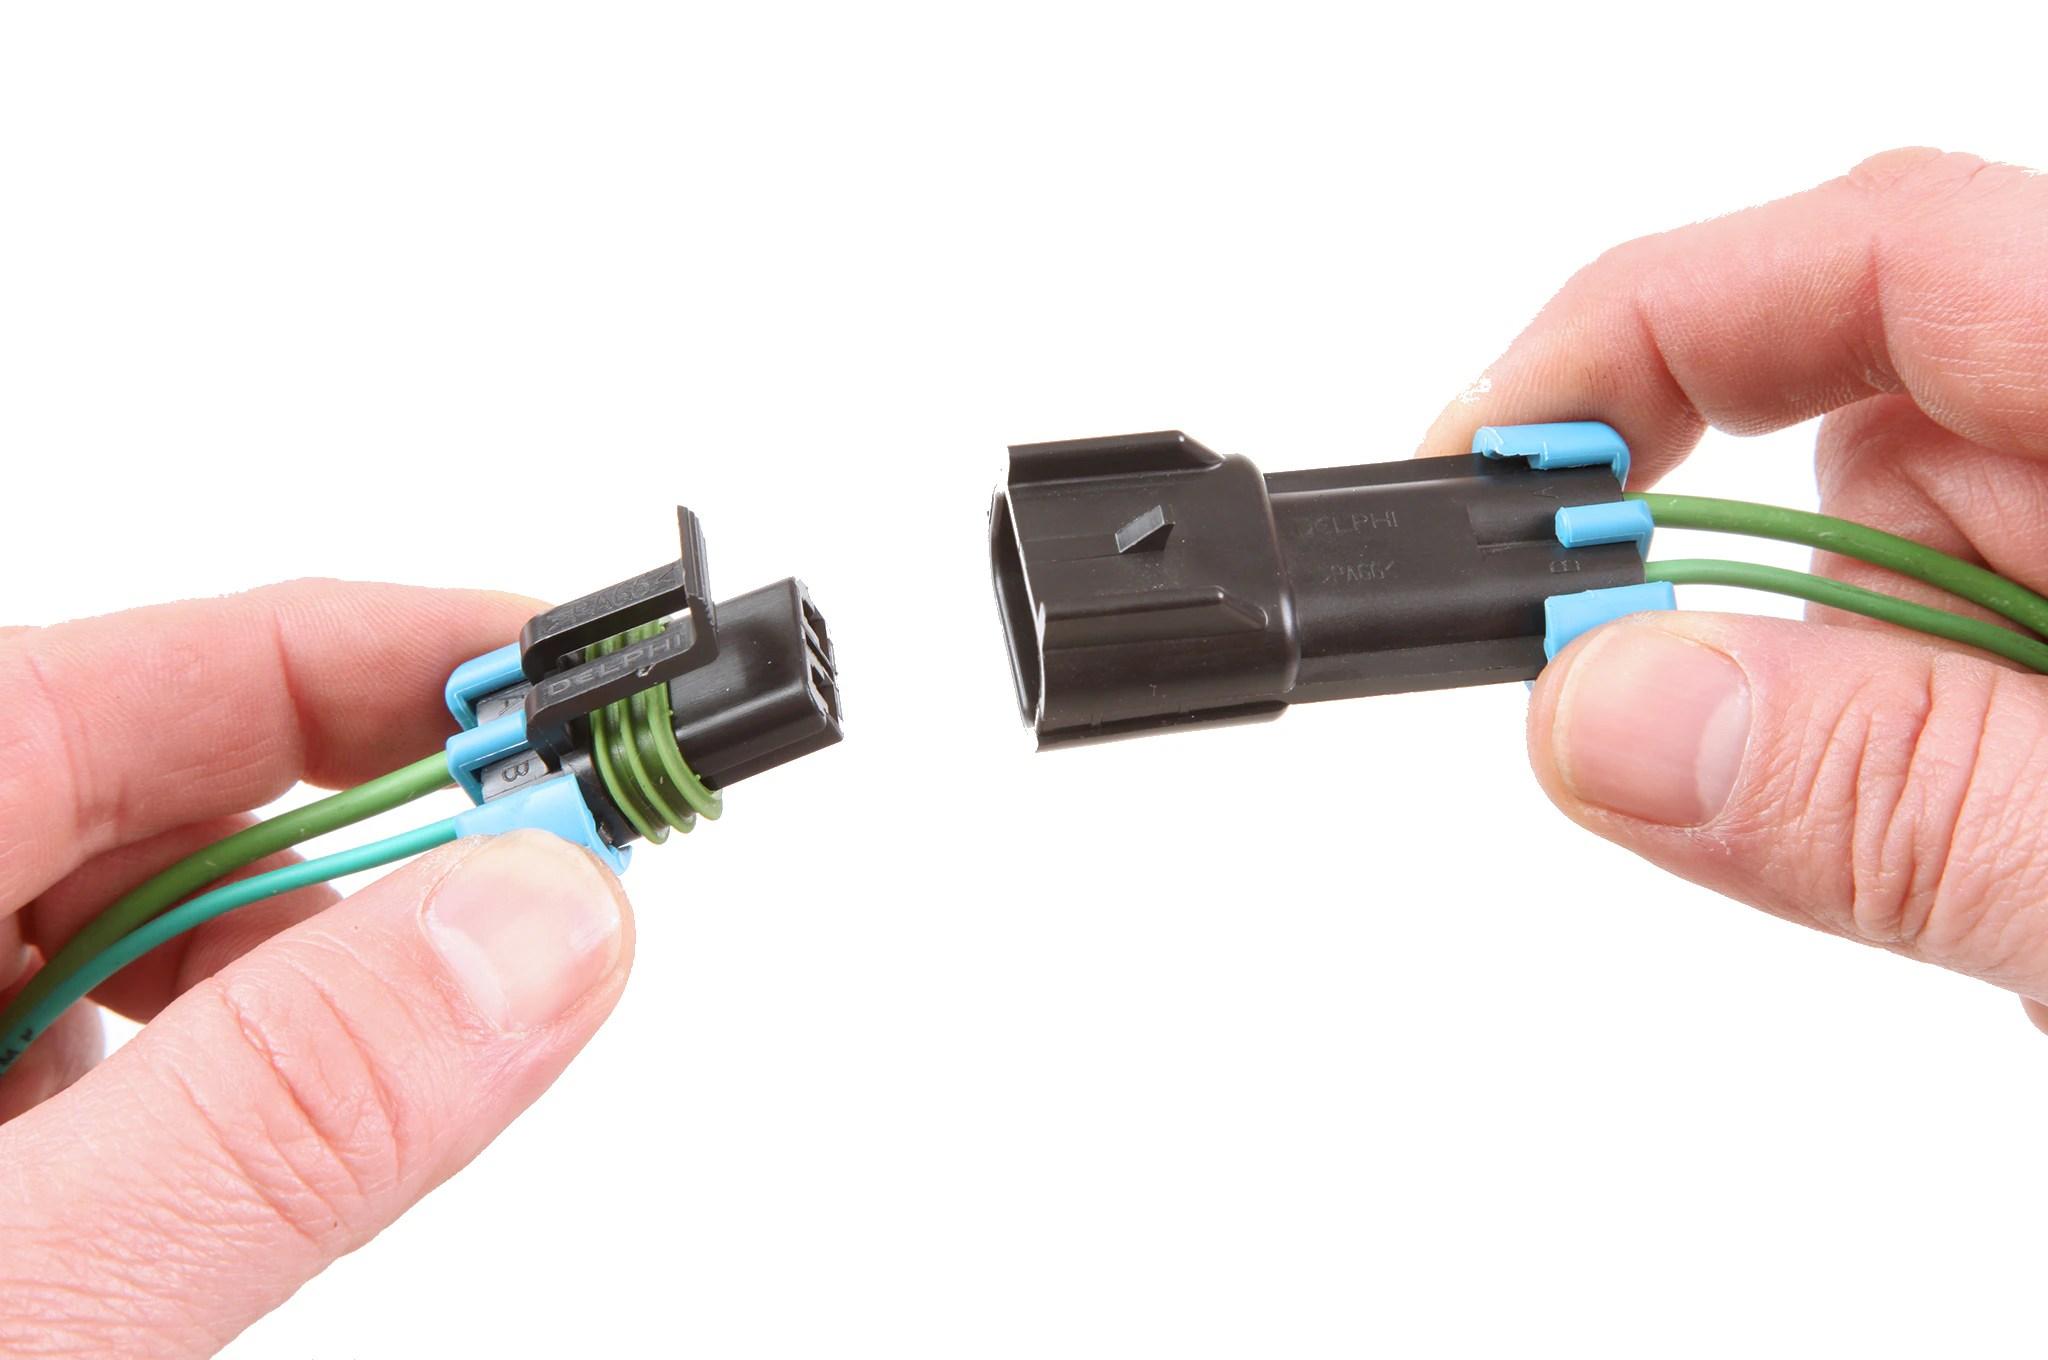 medium resolution of gm wiring harness connector locking wiring diagrams fjgm wiring harness connector locking everything wiring diagram gm